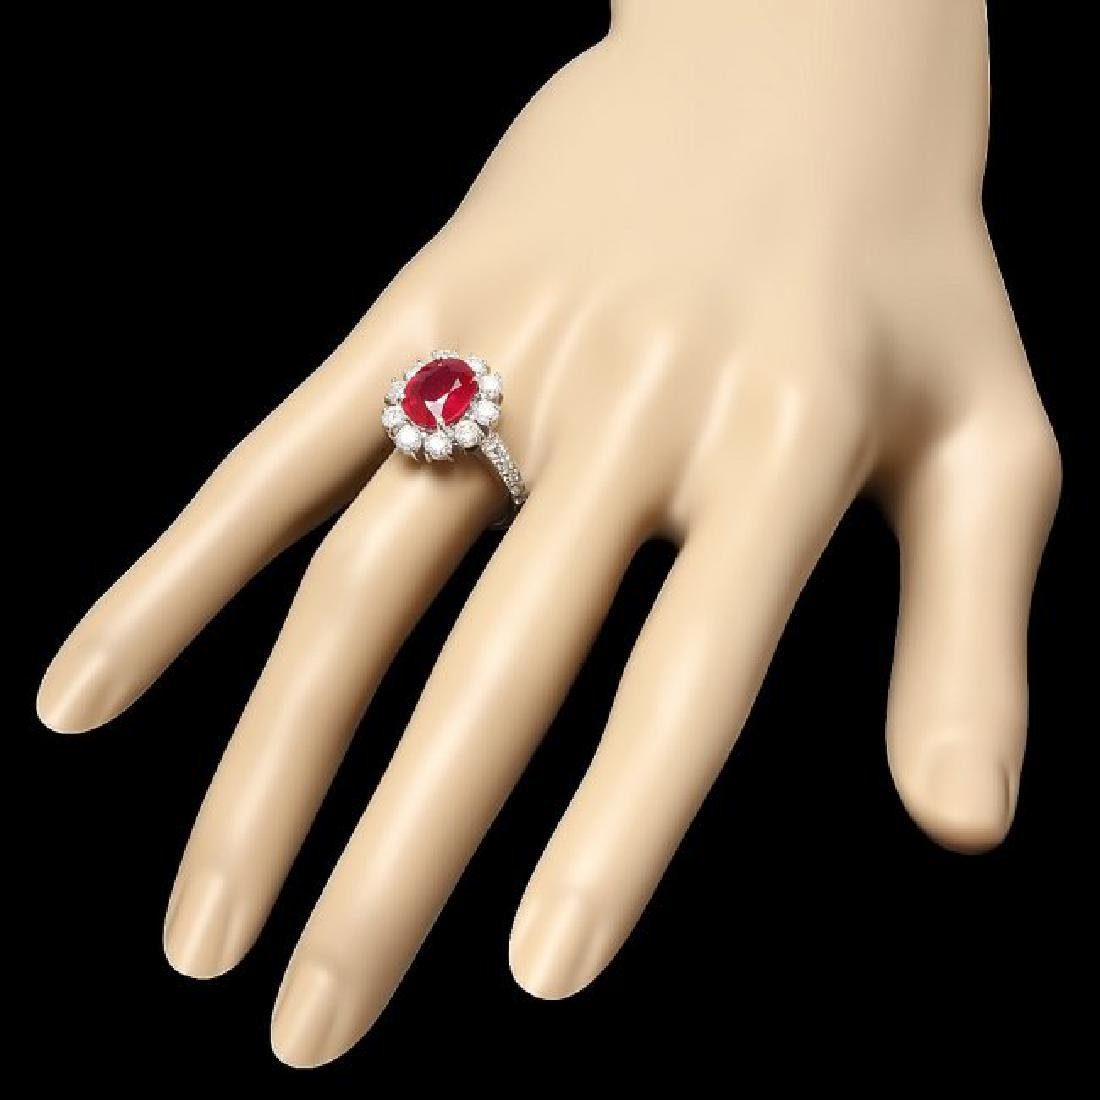 14k White Gold 3.20ct Ruby 1.50ct Diamond Ring - 3